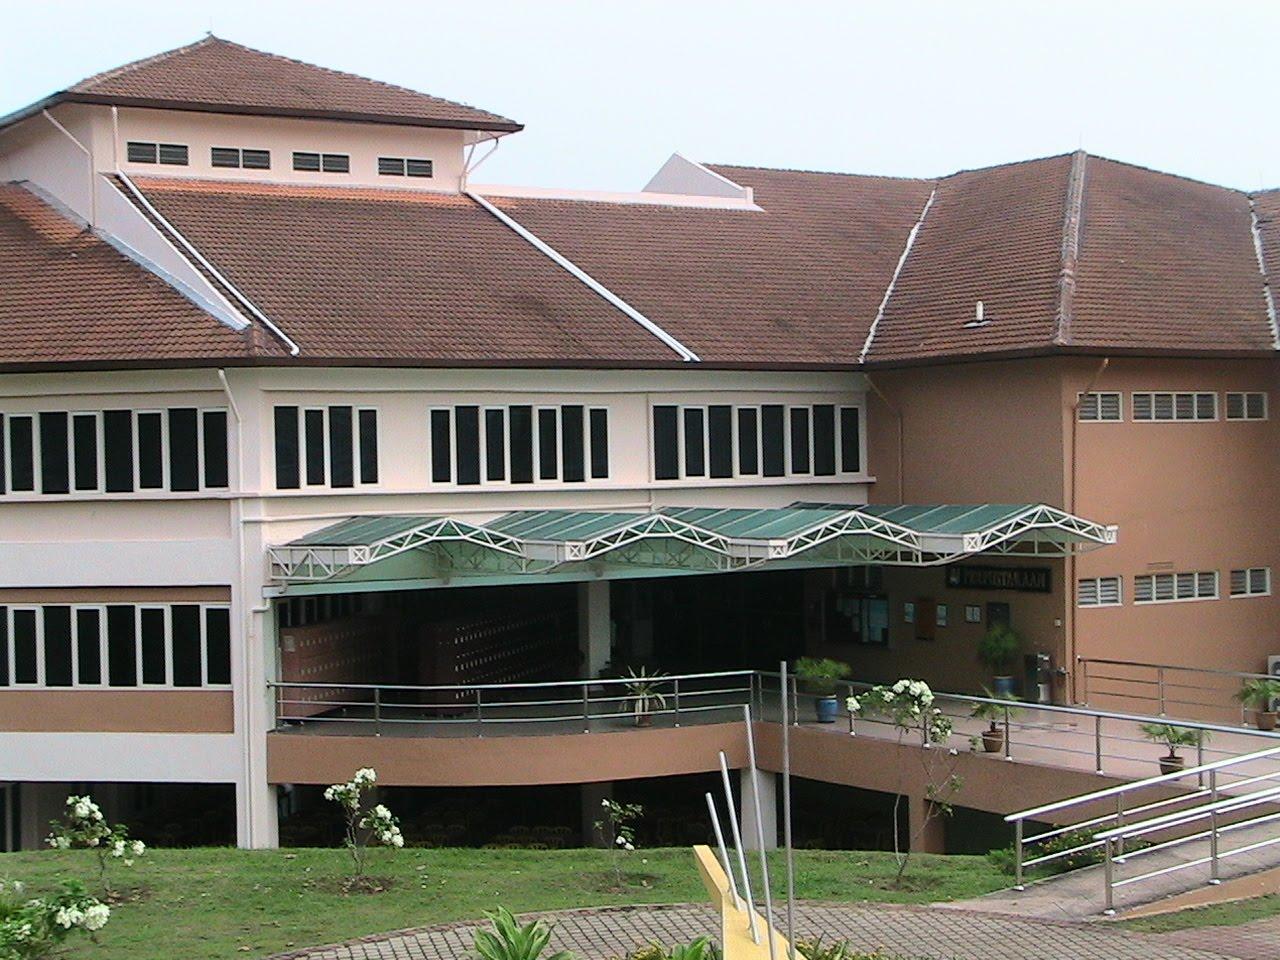 Perpustakaan UiTM Melaka: Sejarah Perpustakaan UiTM Melaka & Pusat Sumber UiTM KBM